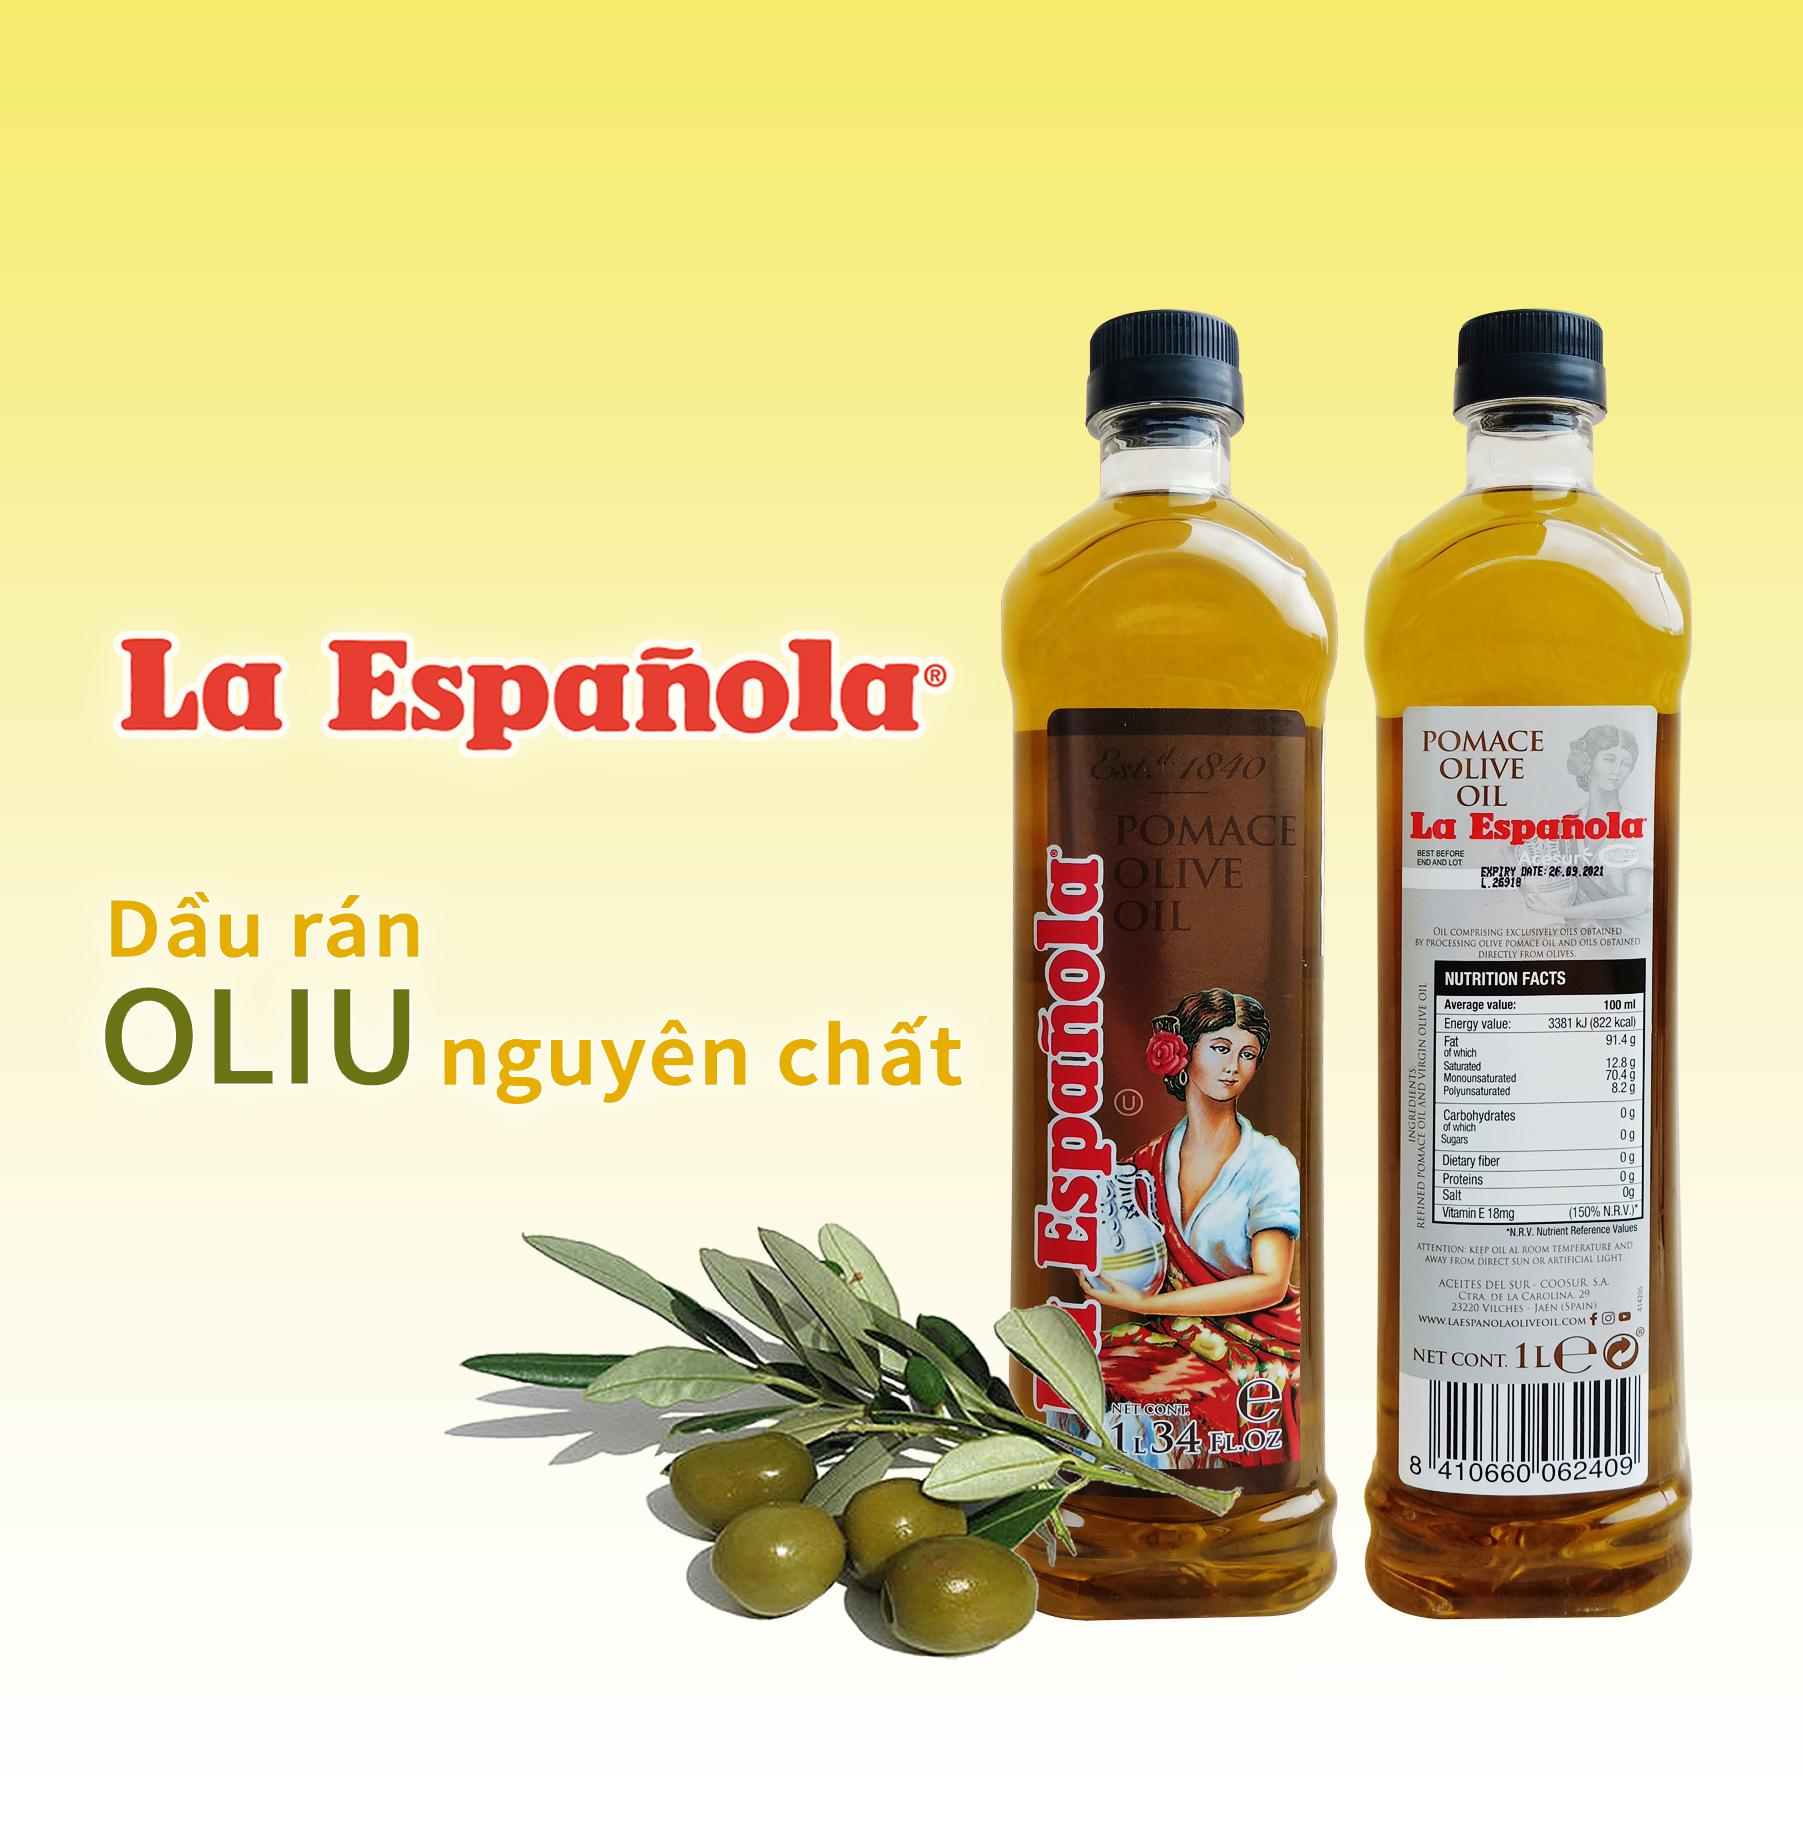 Dầu rán Oliu Pomace La Espanola 1L